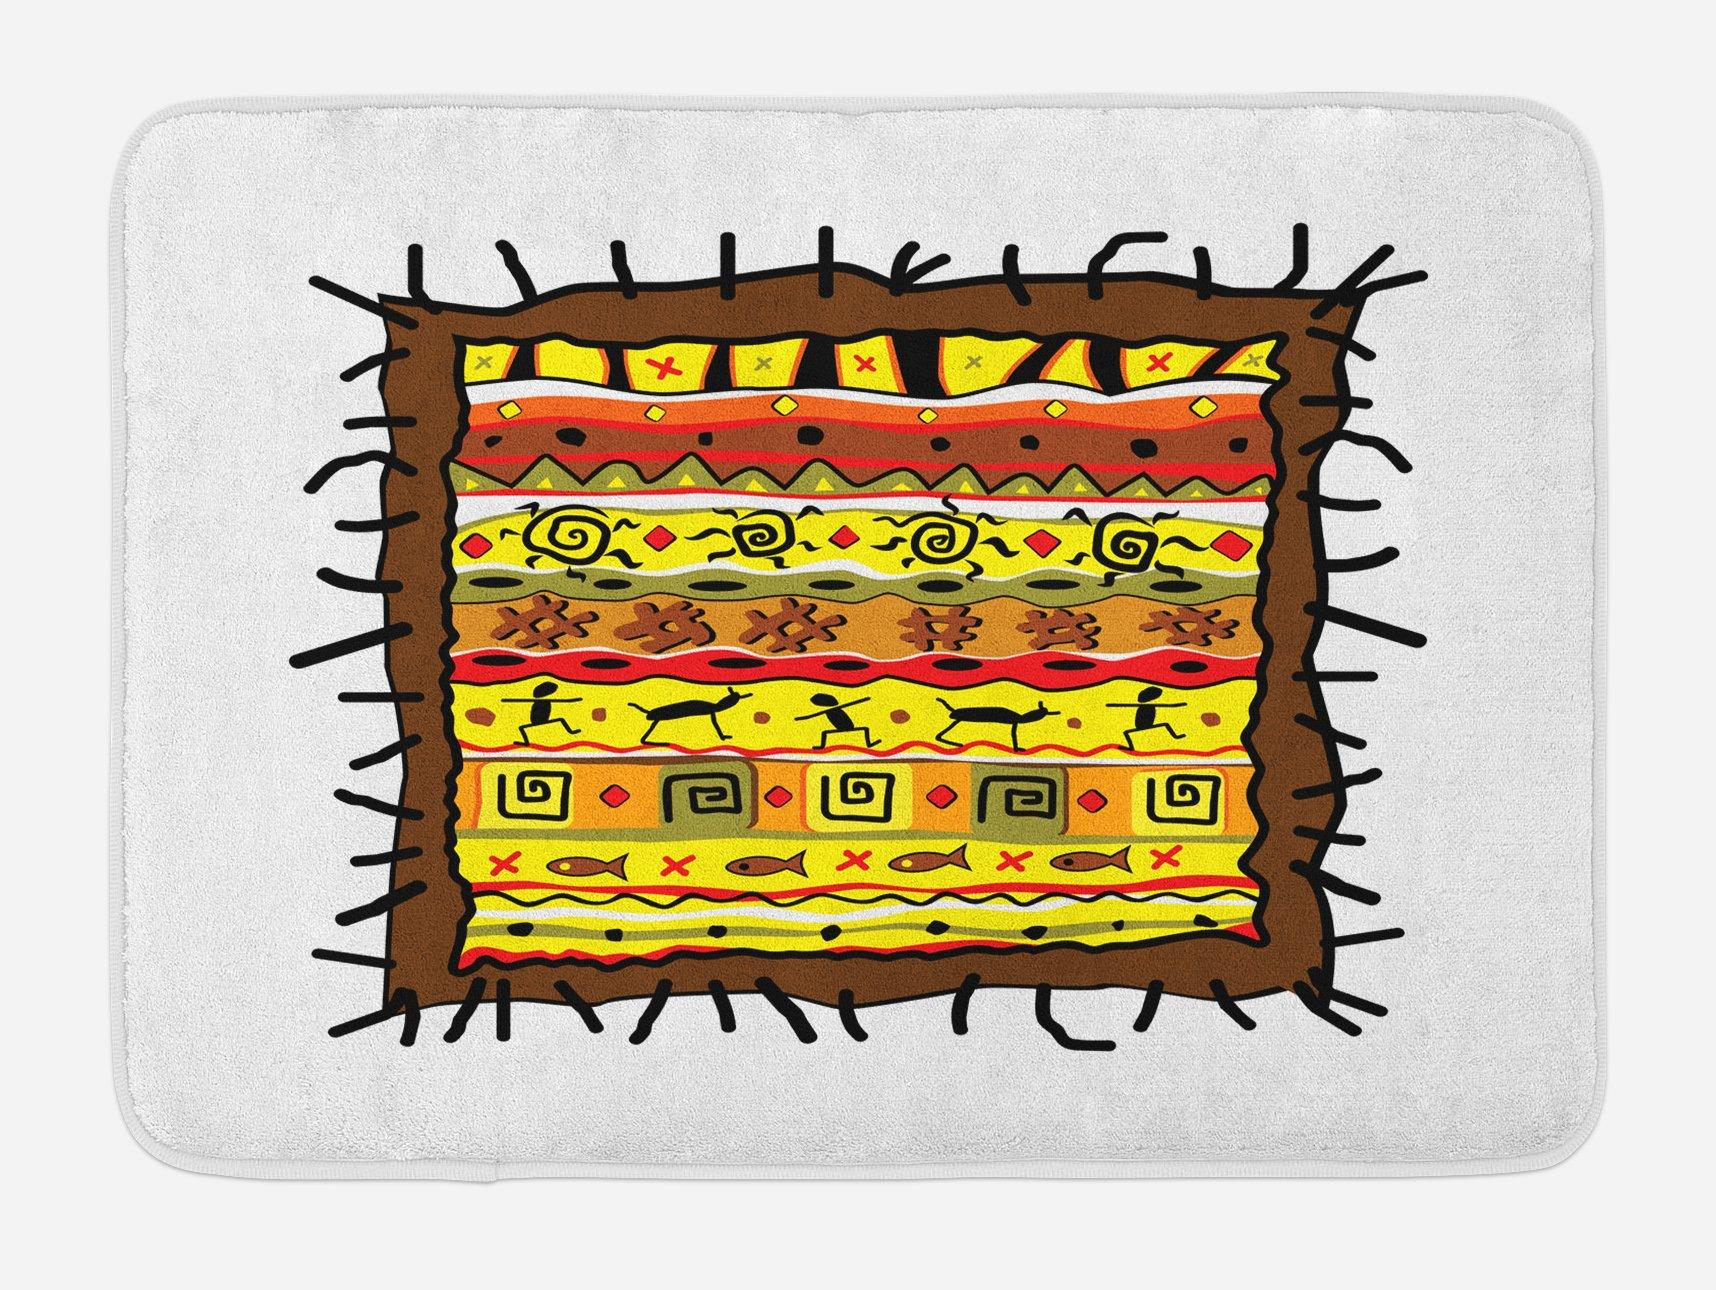 Lunarable Primitive Bath Mat, Aztec Motifs Colorful Latin America Folklore Elements Doodle Style Tribal Pattern, Plush Bathroom Decor Mat with Non Slip Backing, 29.5 W X 17.5 W Inches, Multicolor